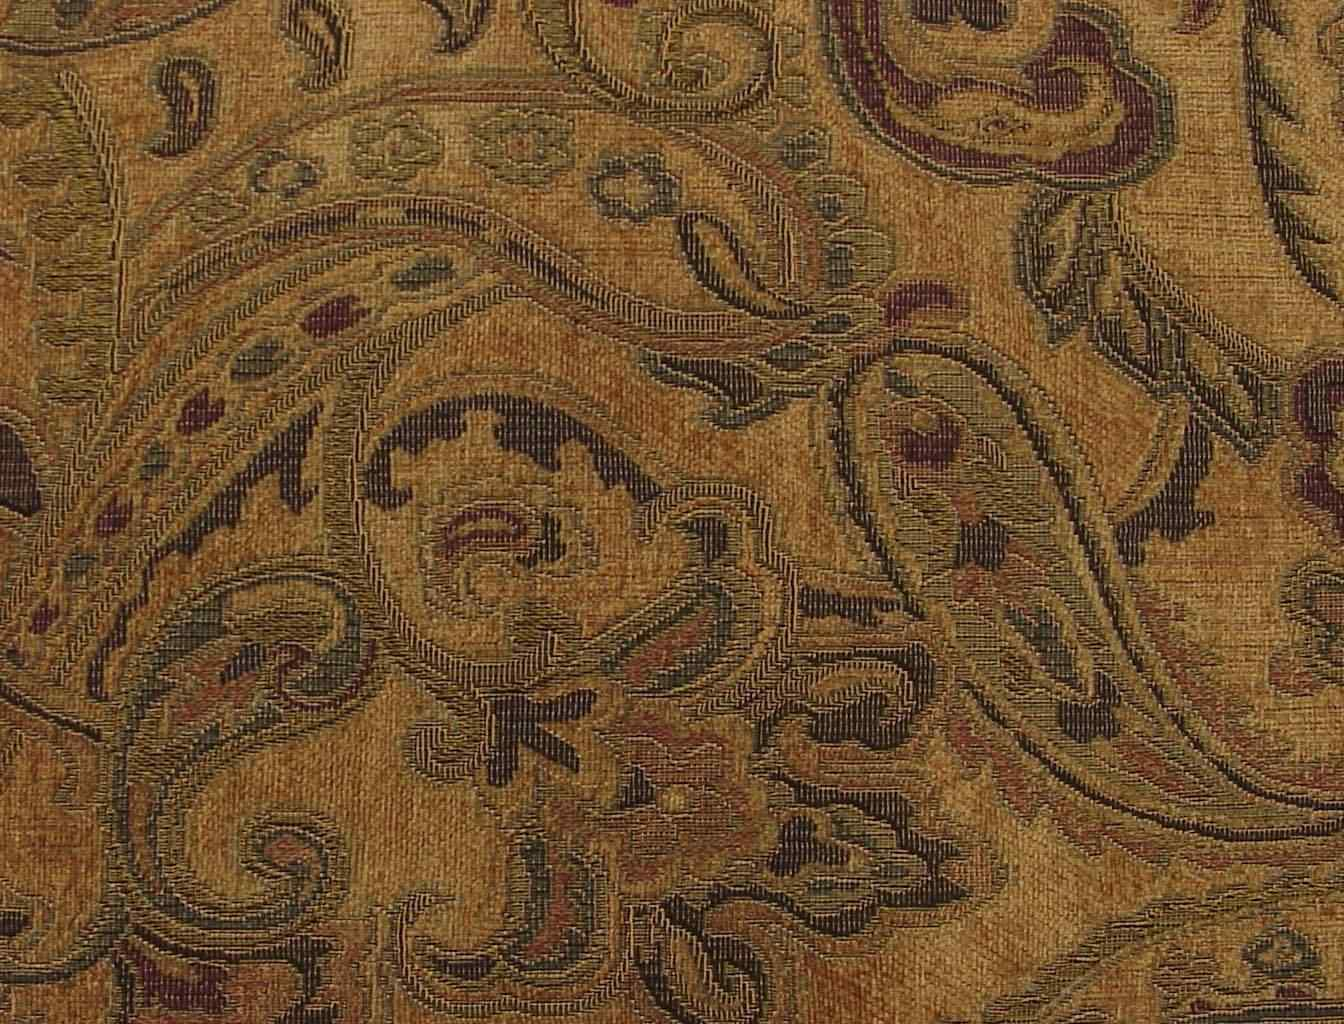 Minky Paisley Print Fabric